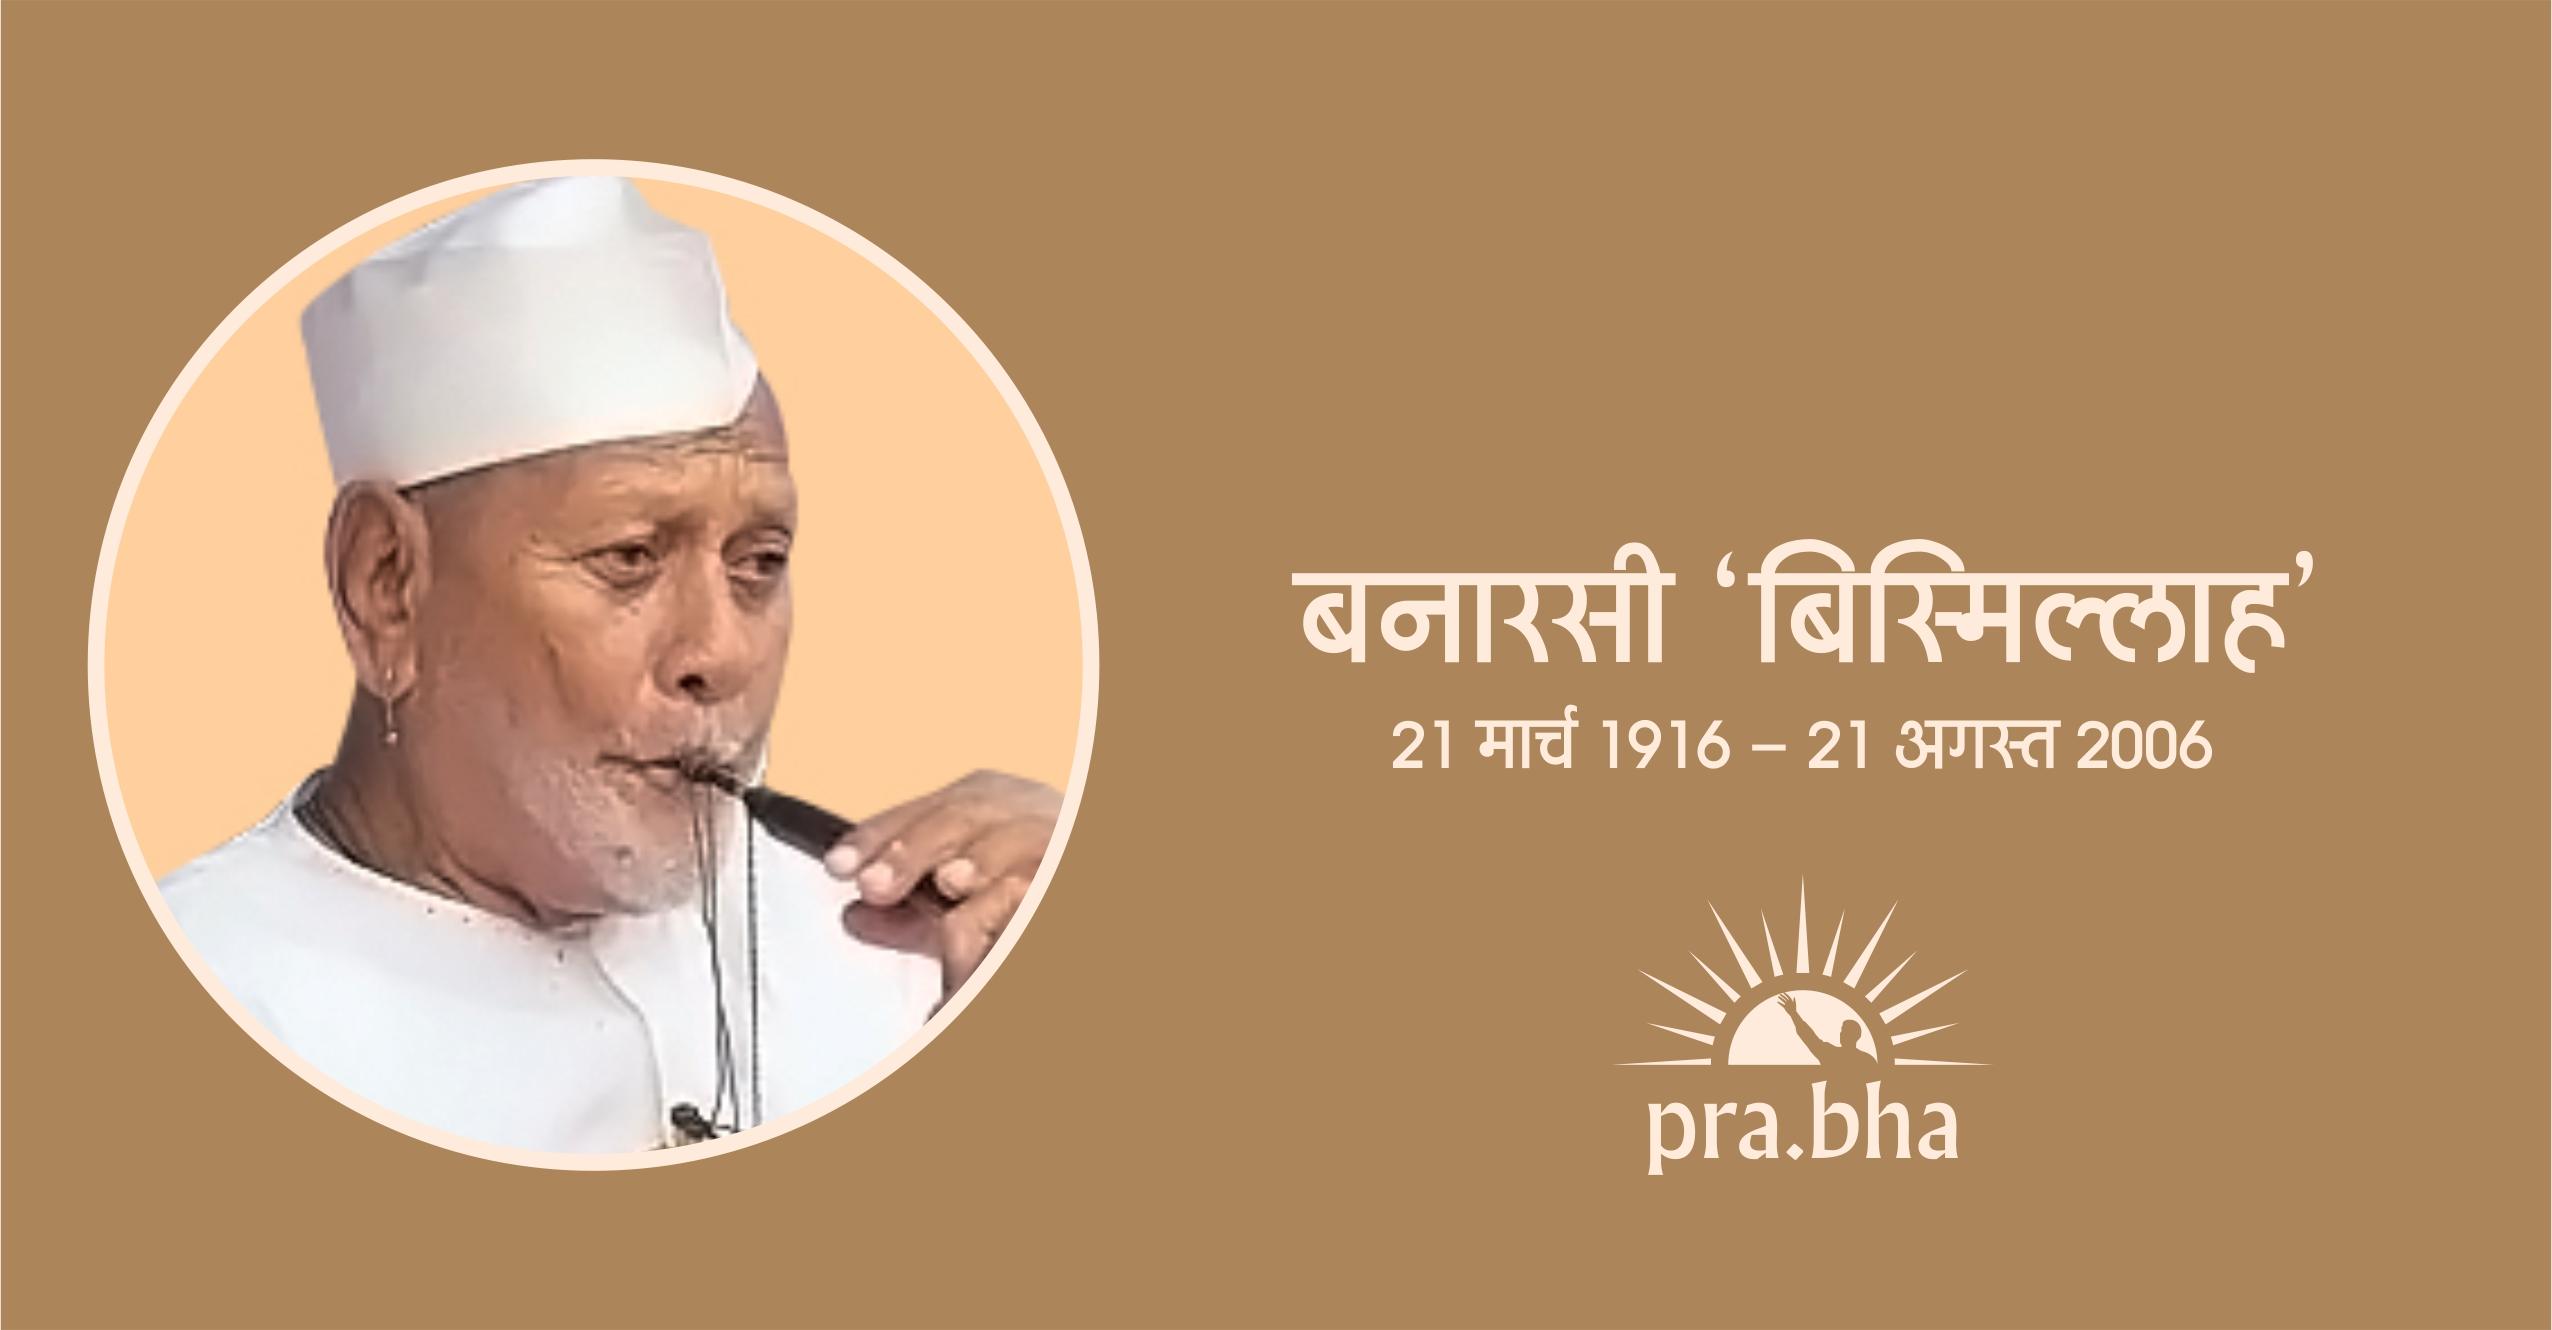 Bharat Ratna 'Bismillah Khan' | The King of Shehnai | Prabha